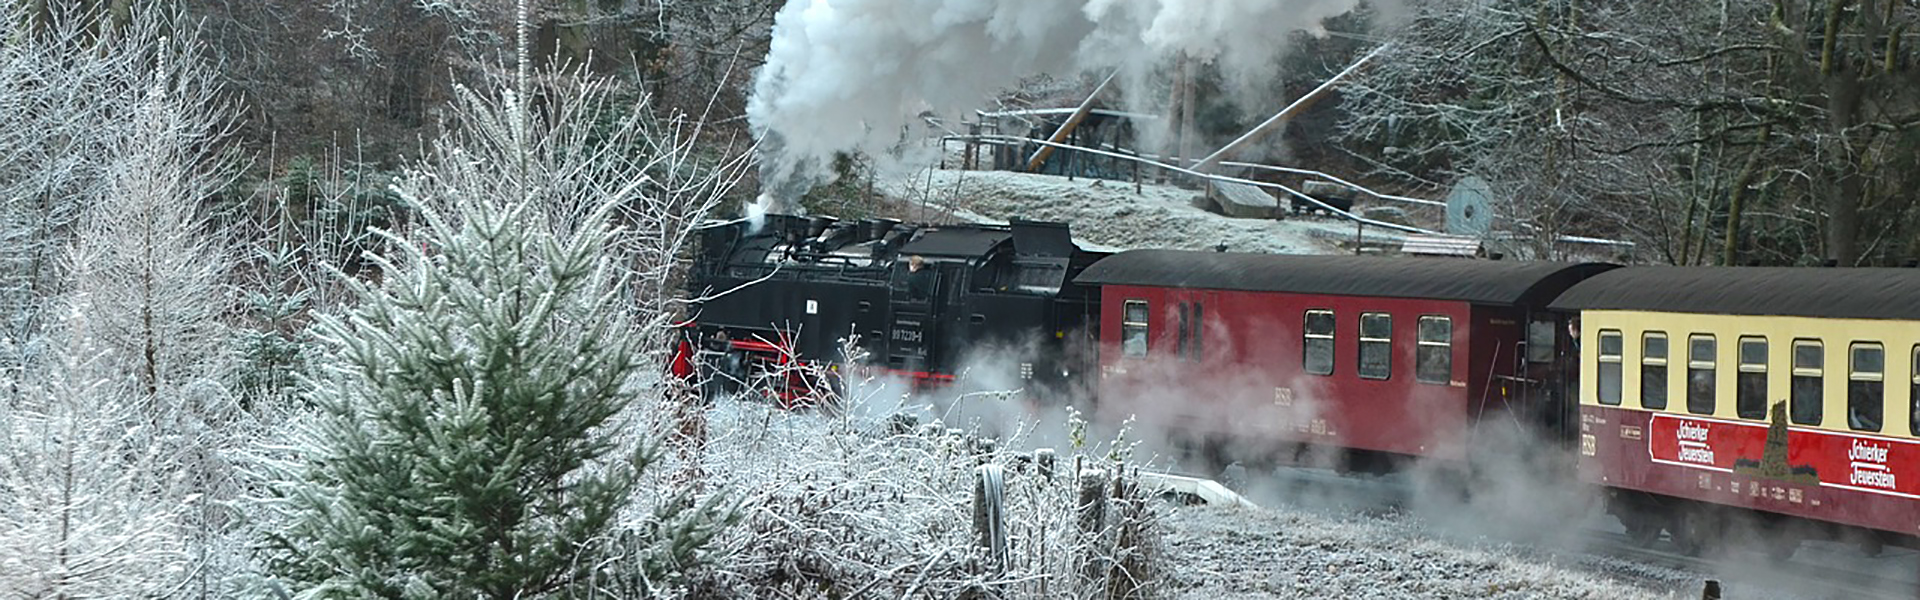 slide2-steam-locomotive-1921298_1280